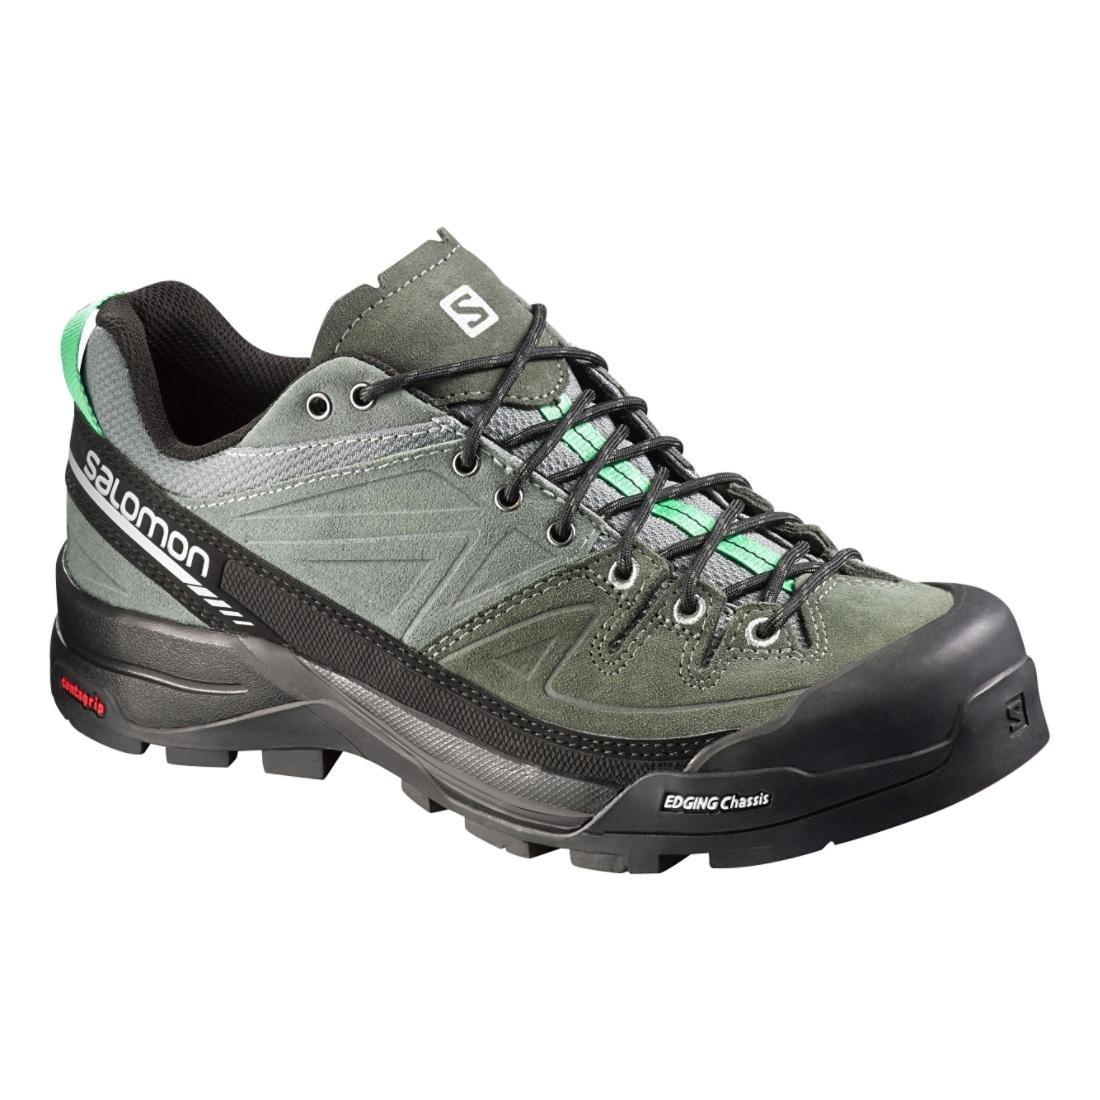 Salomon Women's X Alp LTR W Leather Hiking Sneaker B00ZLMX9PA 8 B(M) US|Light Tt, Night Forest, Jade Green